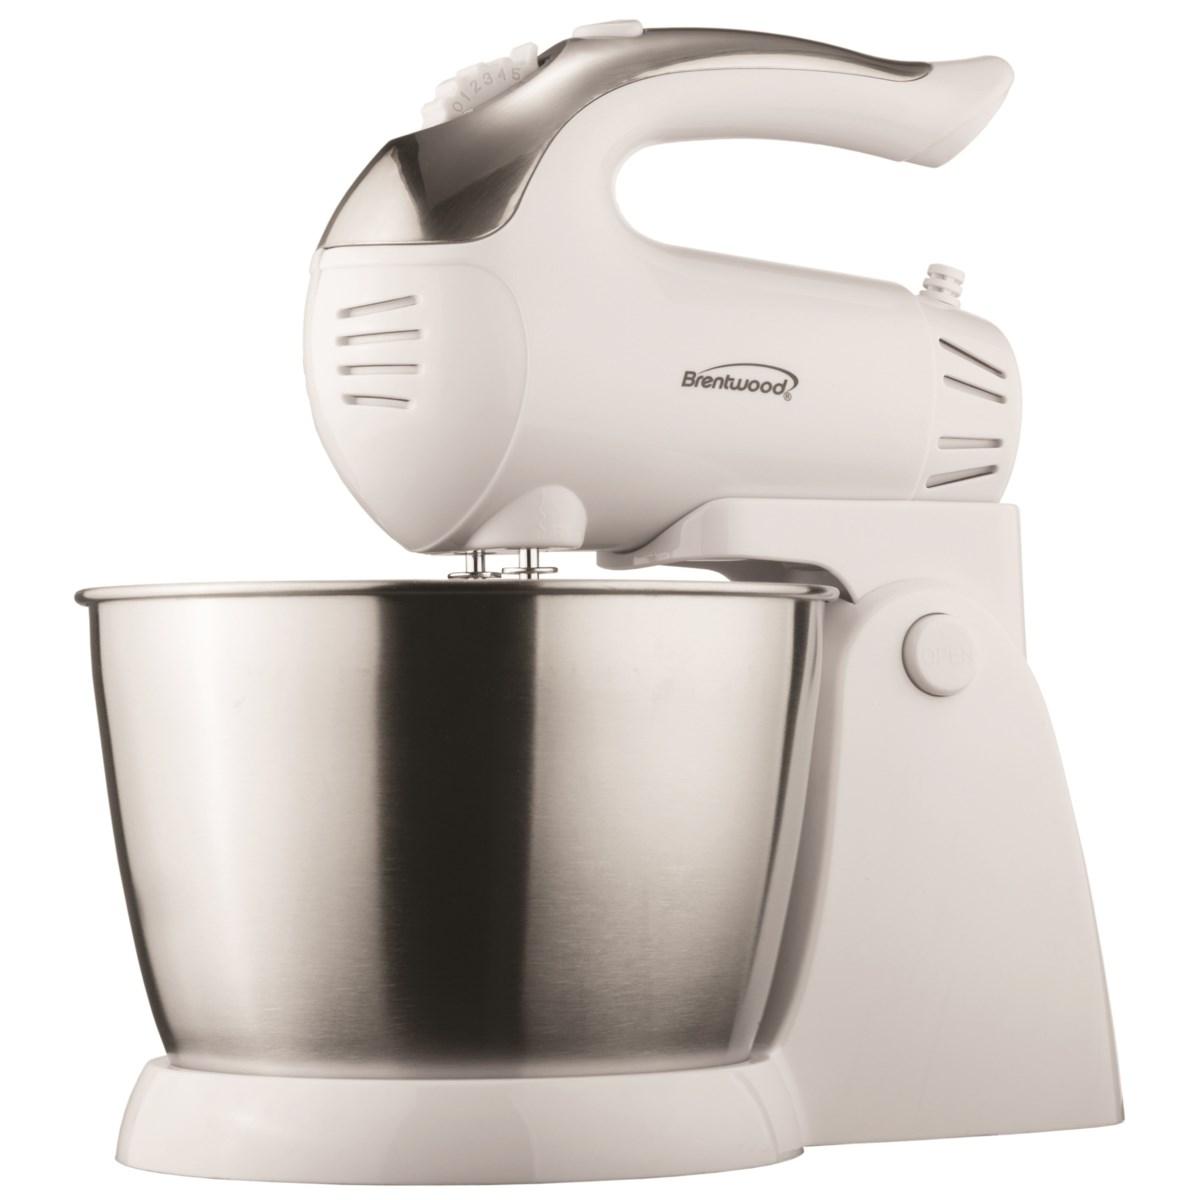 Stand Mixer 3.1QT S/S Mixing Bowl 200W cETL Wte